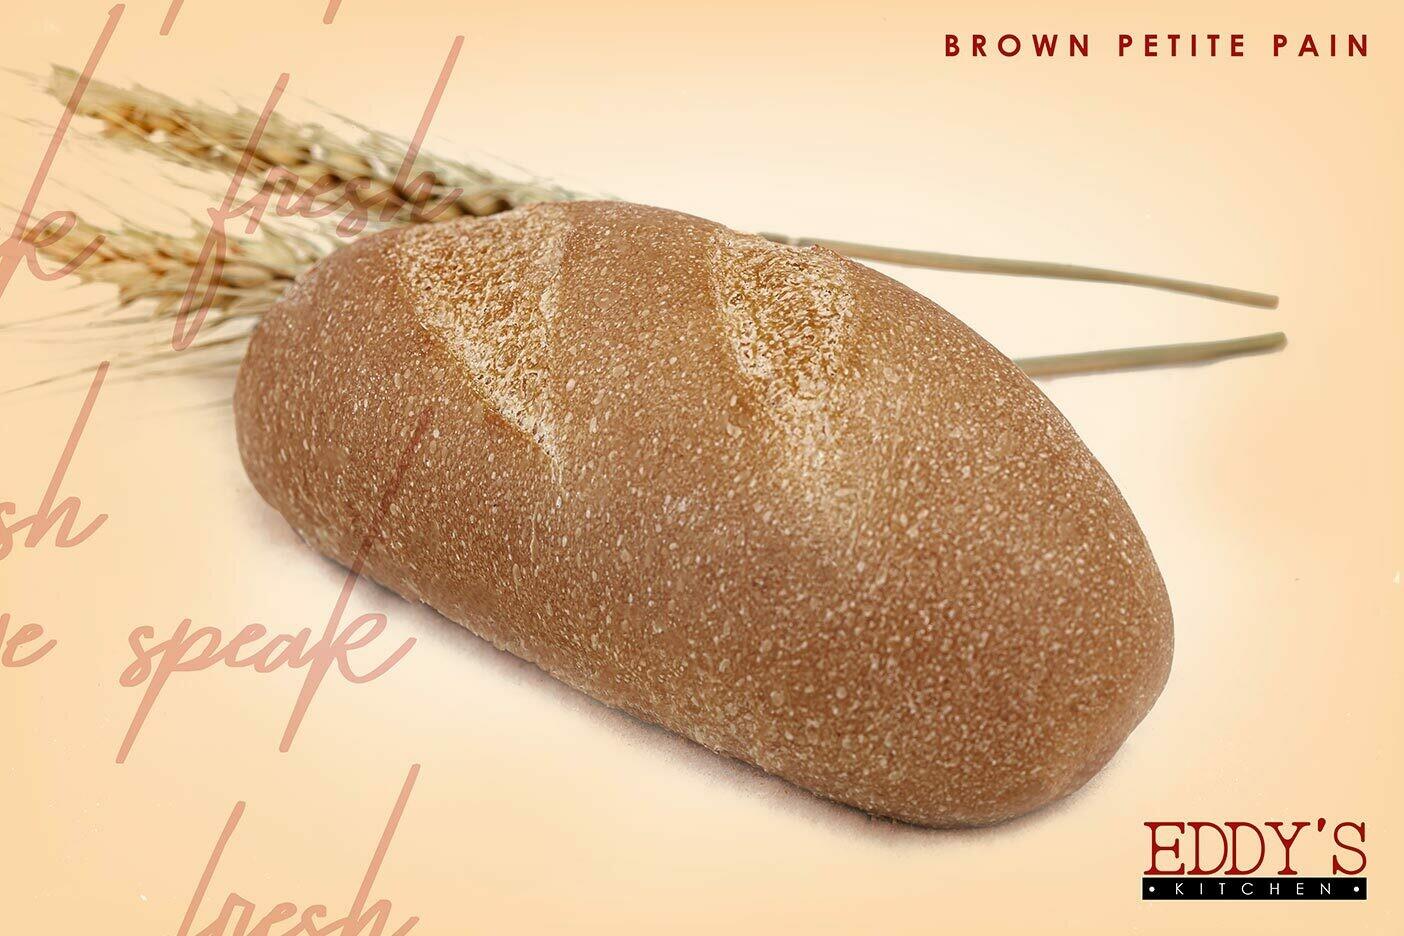 Brown Petite Pain (6) بيتي بان بني